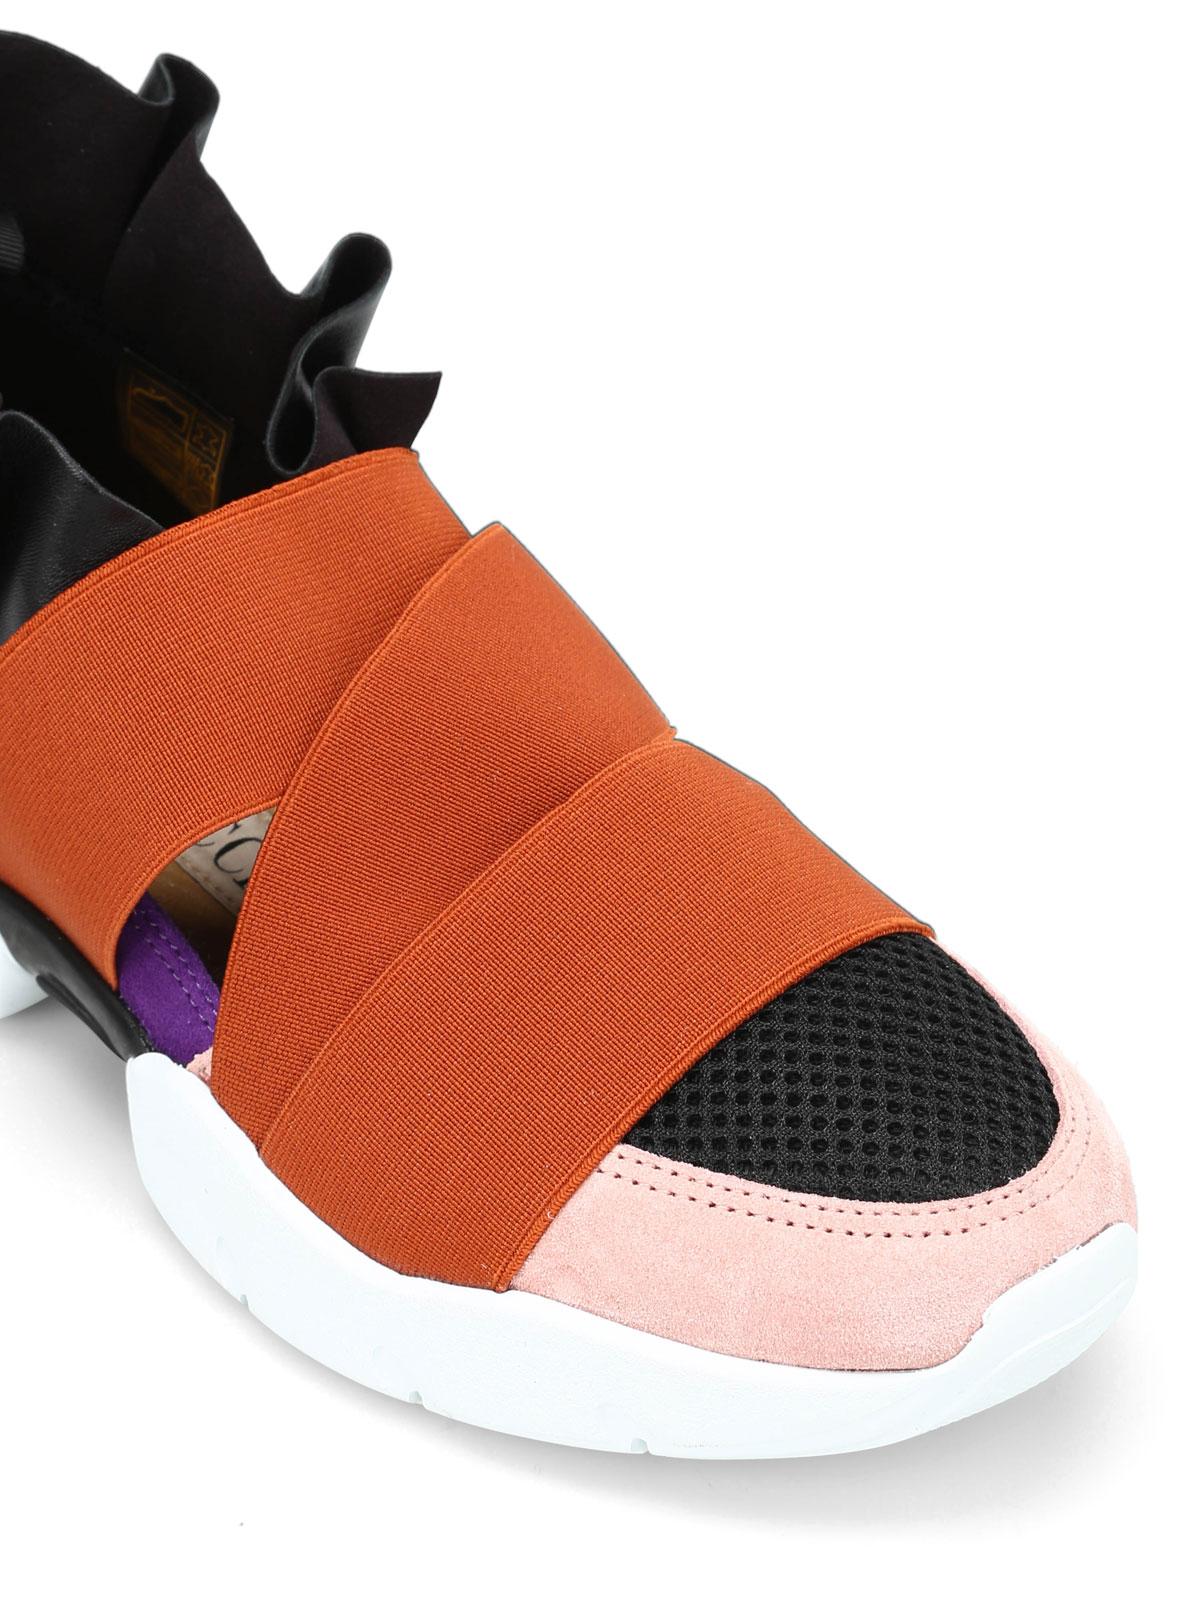 Emilio Pucci - Leather and neoprene